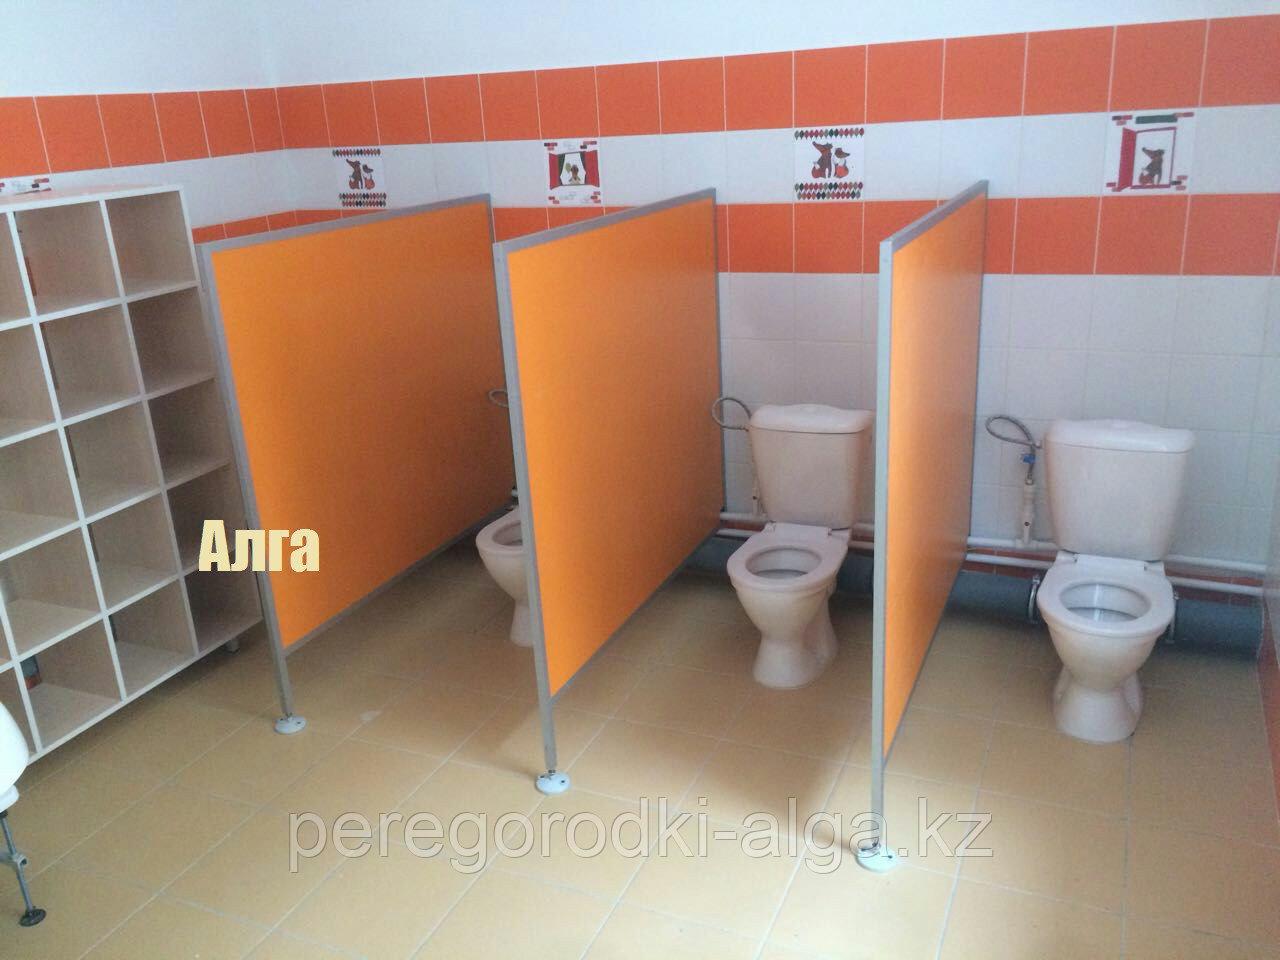 Детская туалетная кабина из ЛДСП 16 мм